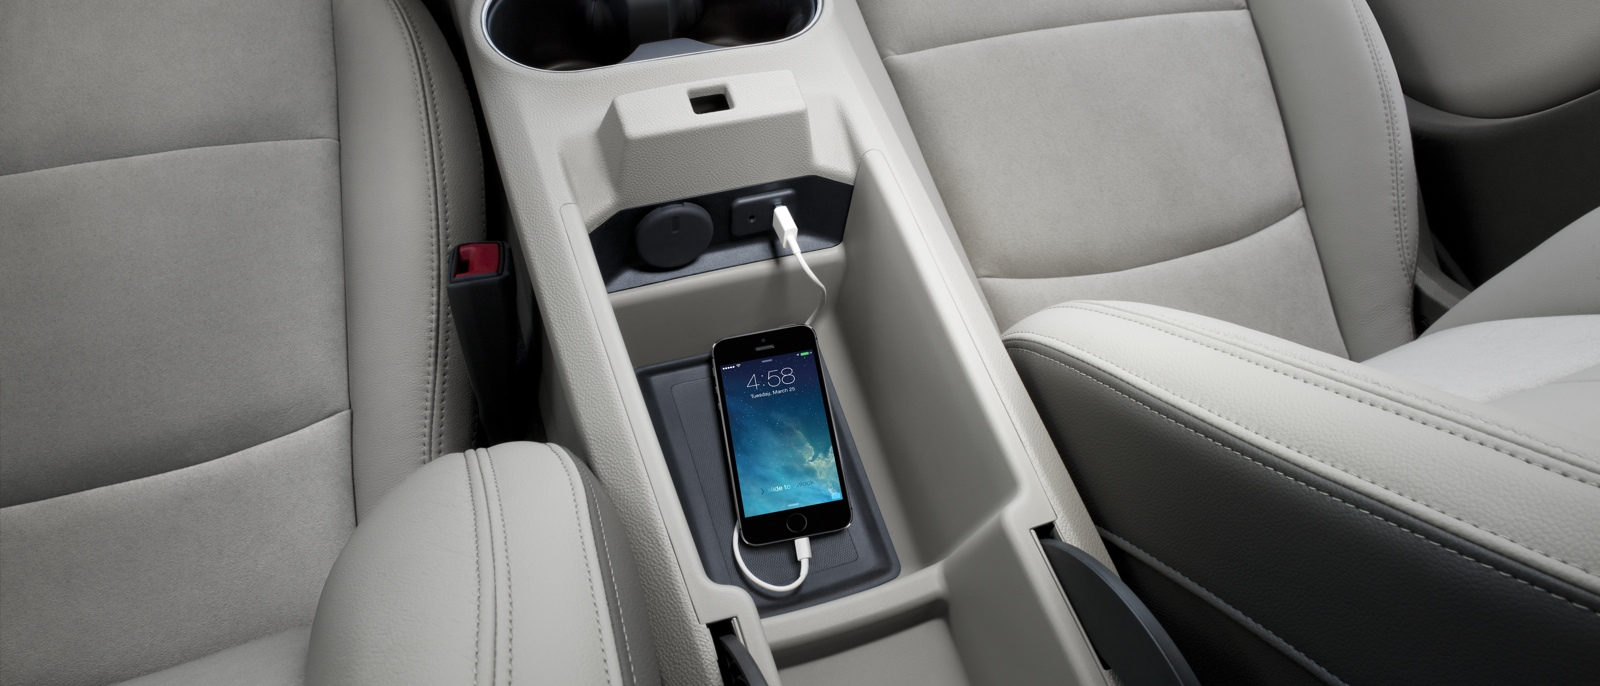 2015 Chevrolet Volt Audio Hookup